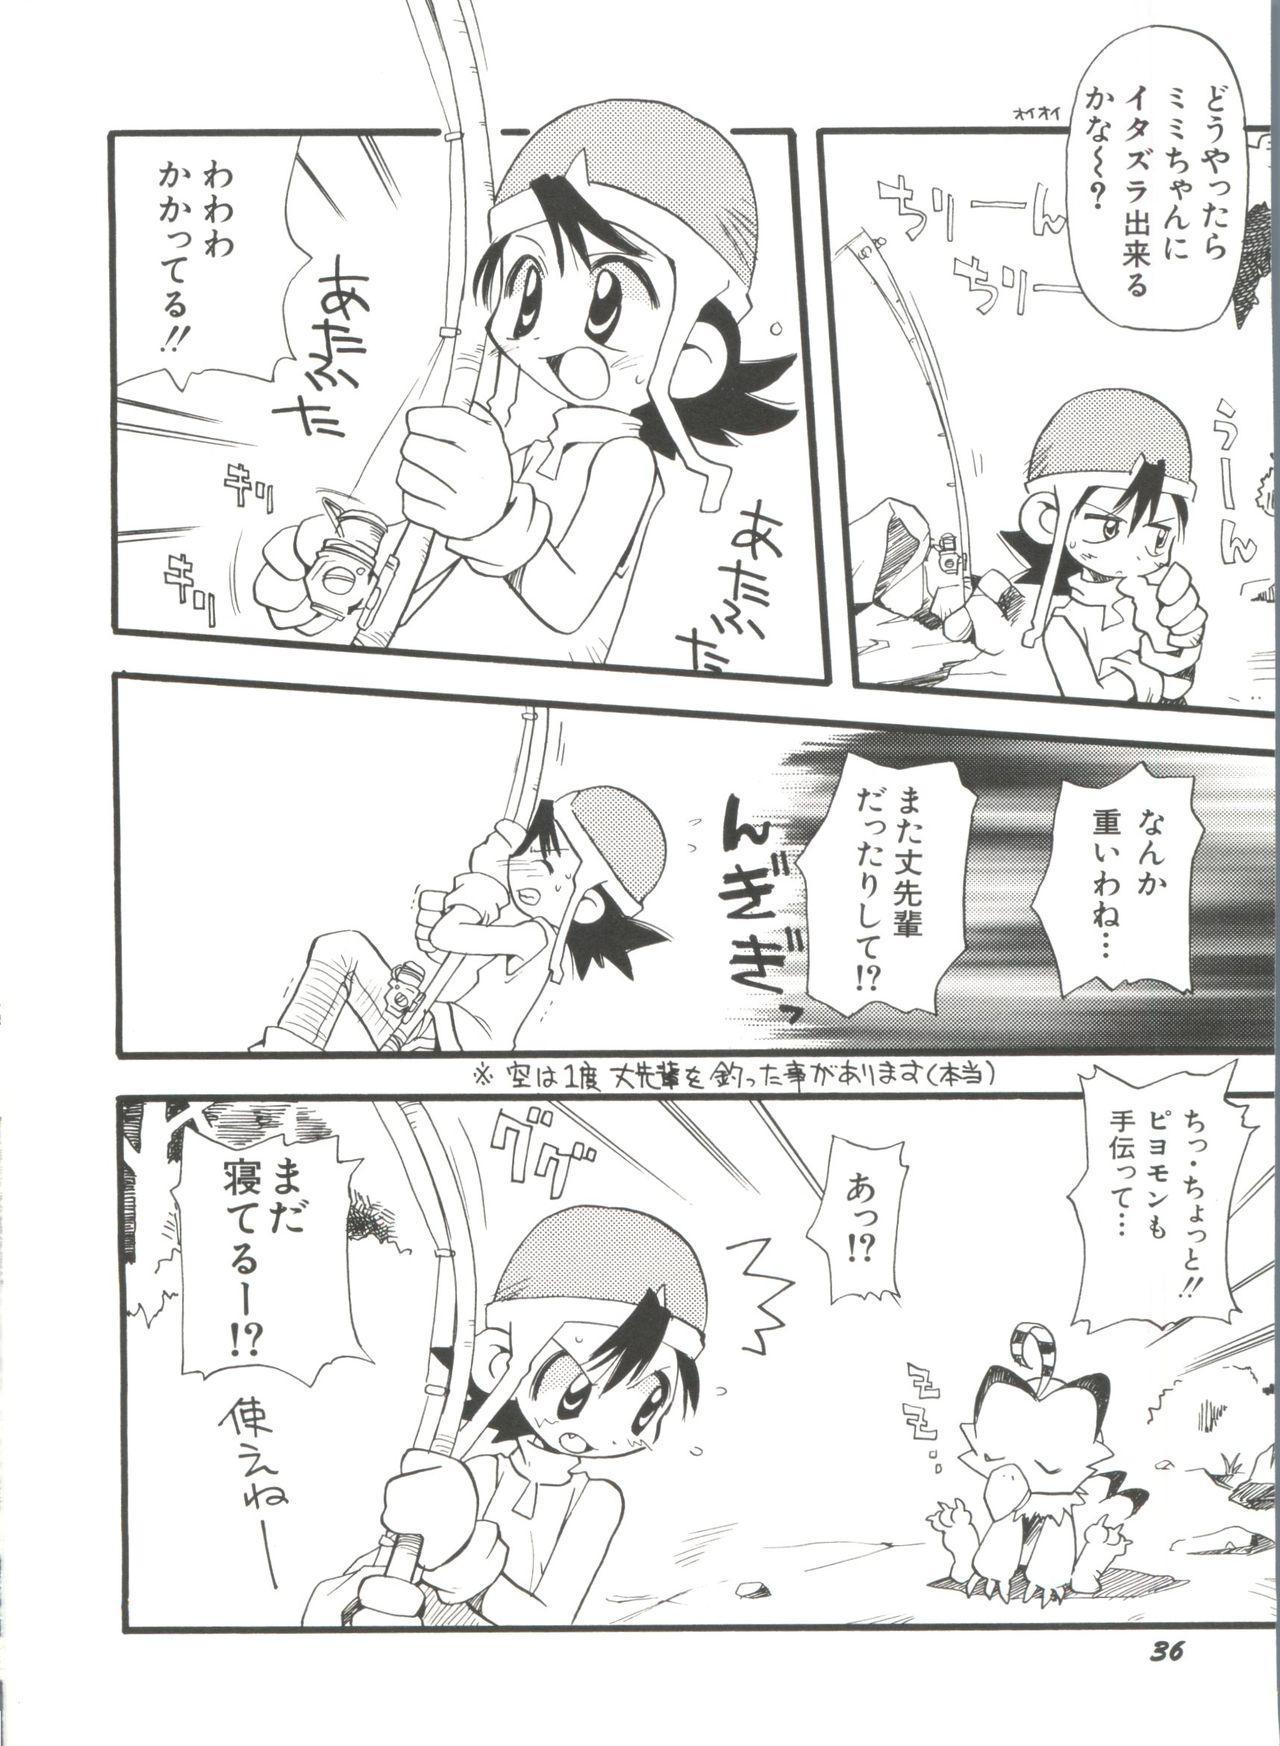 [Anthology] Denei Tamatebako 8 - Utakata no Tenshi-tachi II (Various) 37